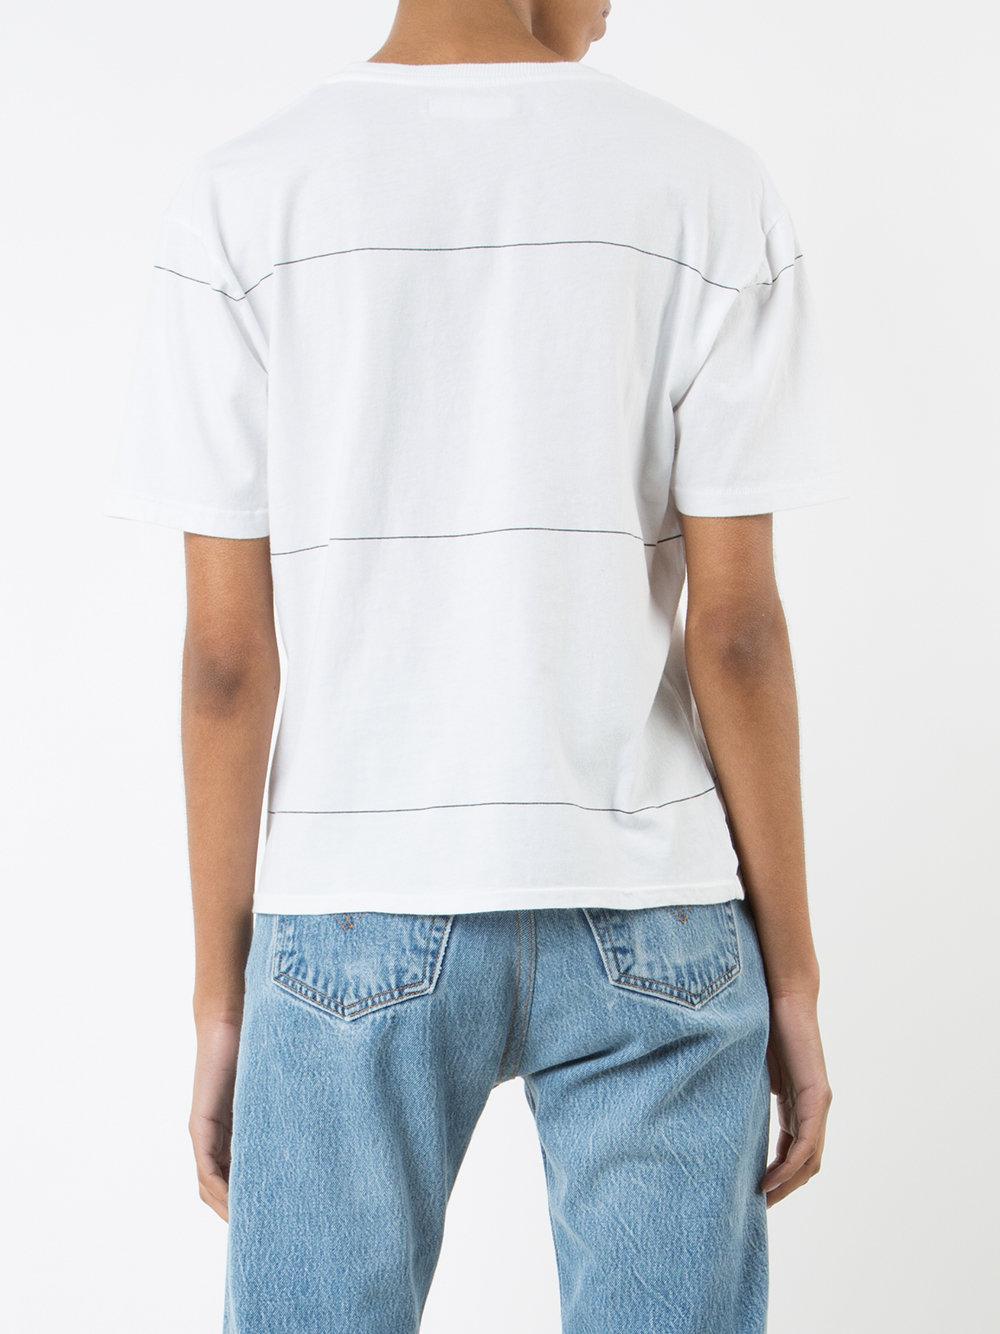 Anine Bing Striped T-shirt in White